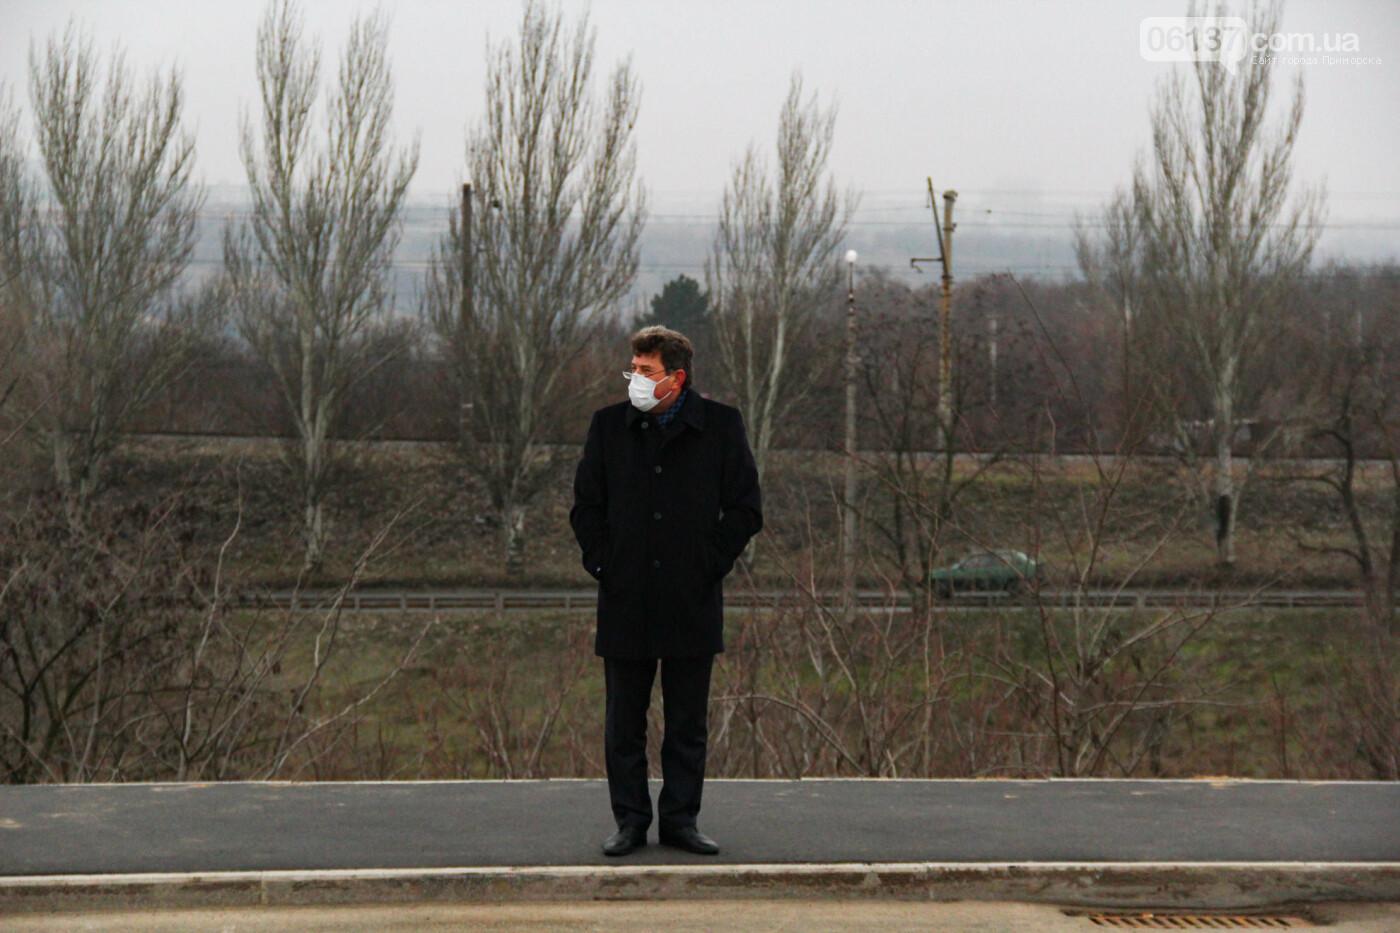 Запорожские журналисты опубликовали фотокурьез поводу мэра Буряка на новом мосту. Фото, фото-1